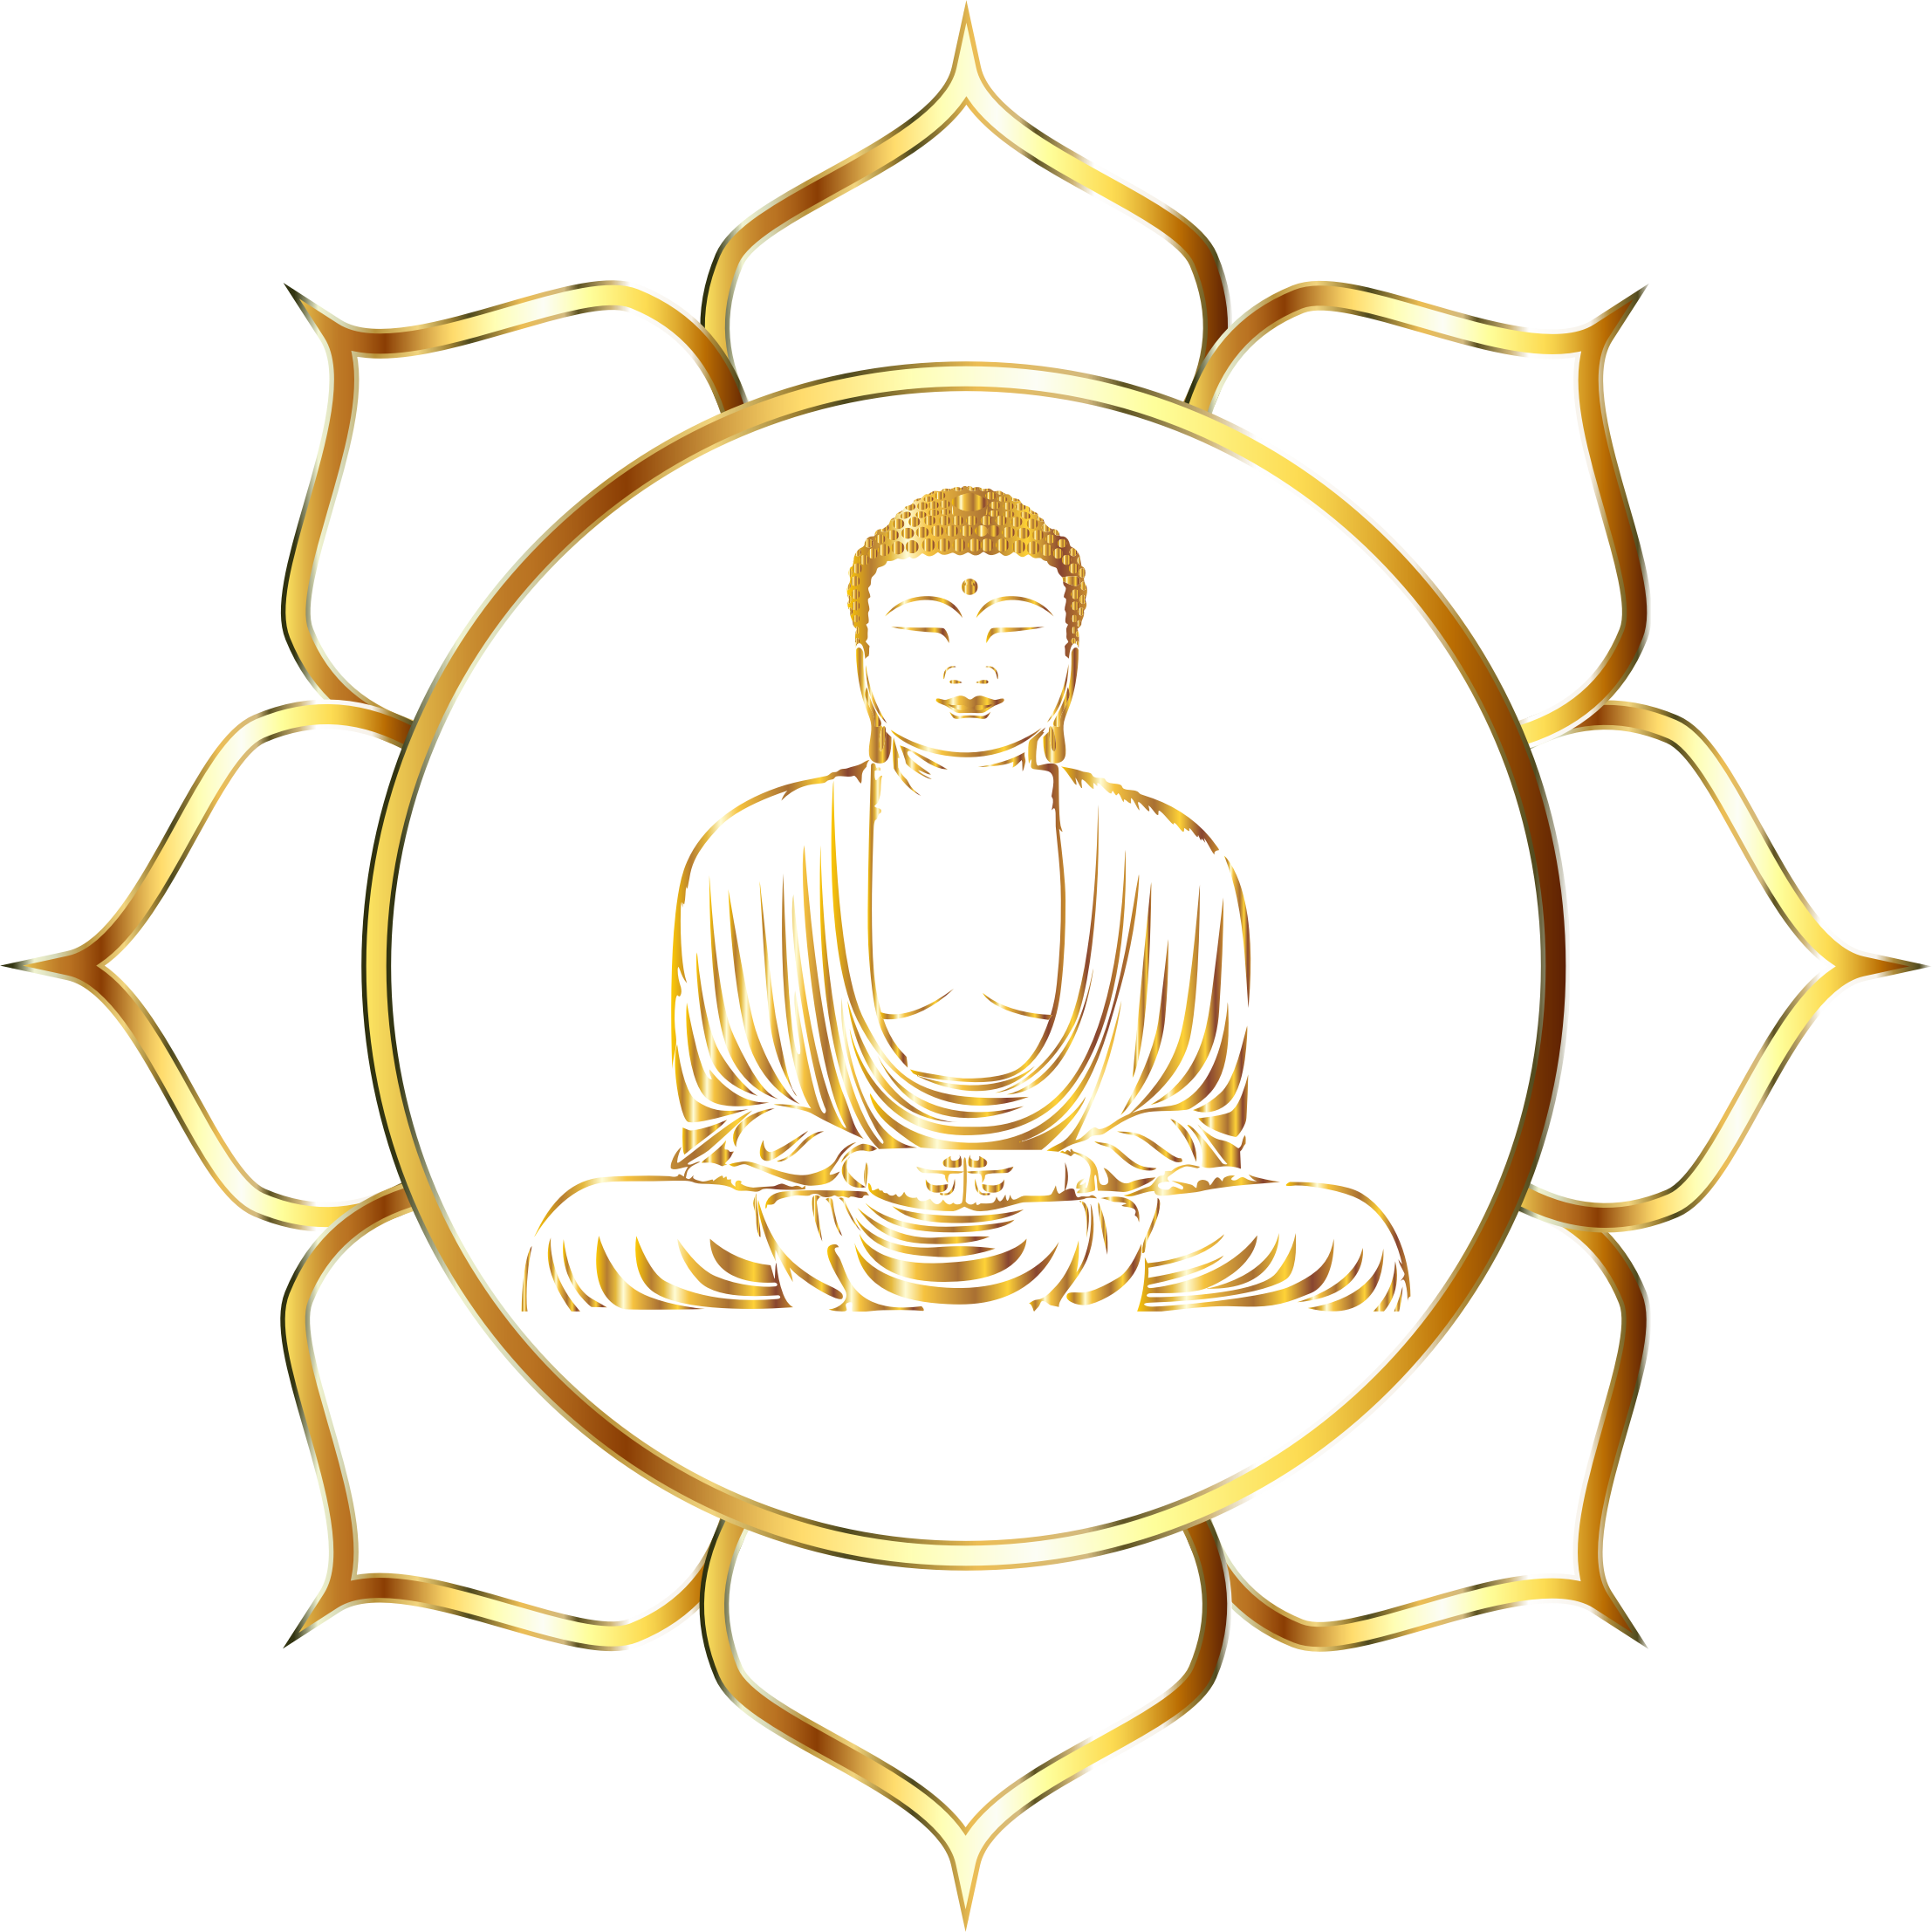 Clipart Gold Buddha Lotus No Background